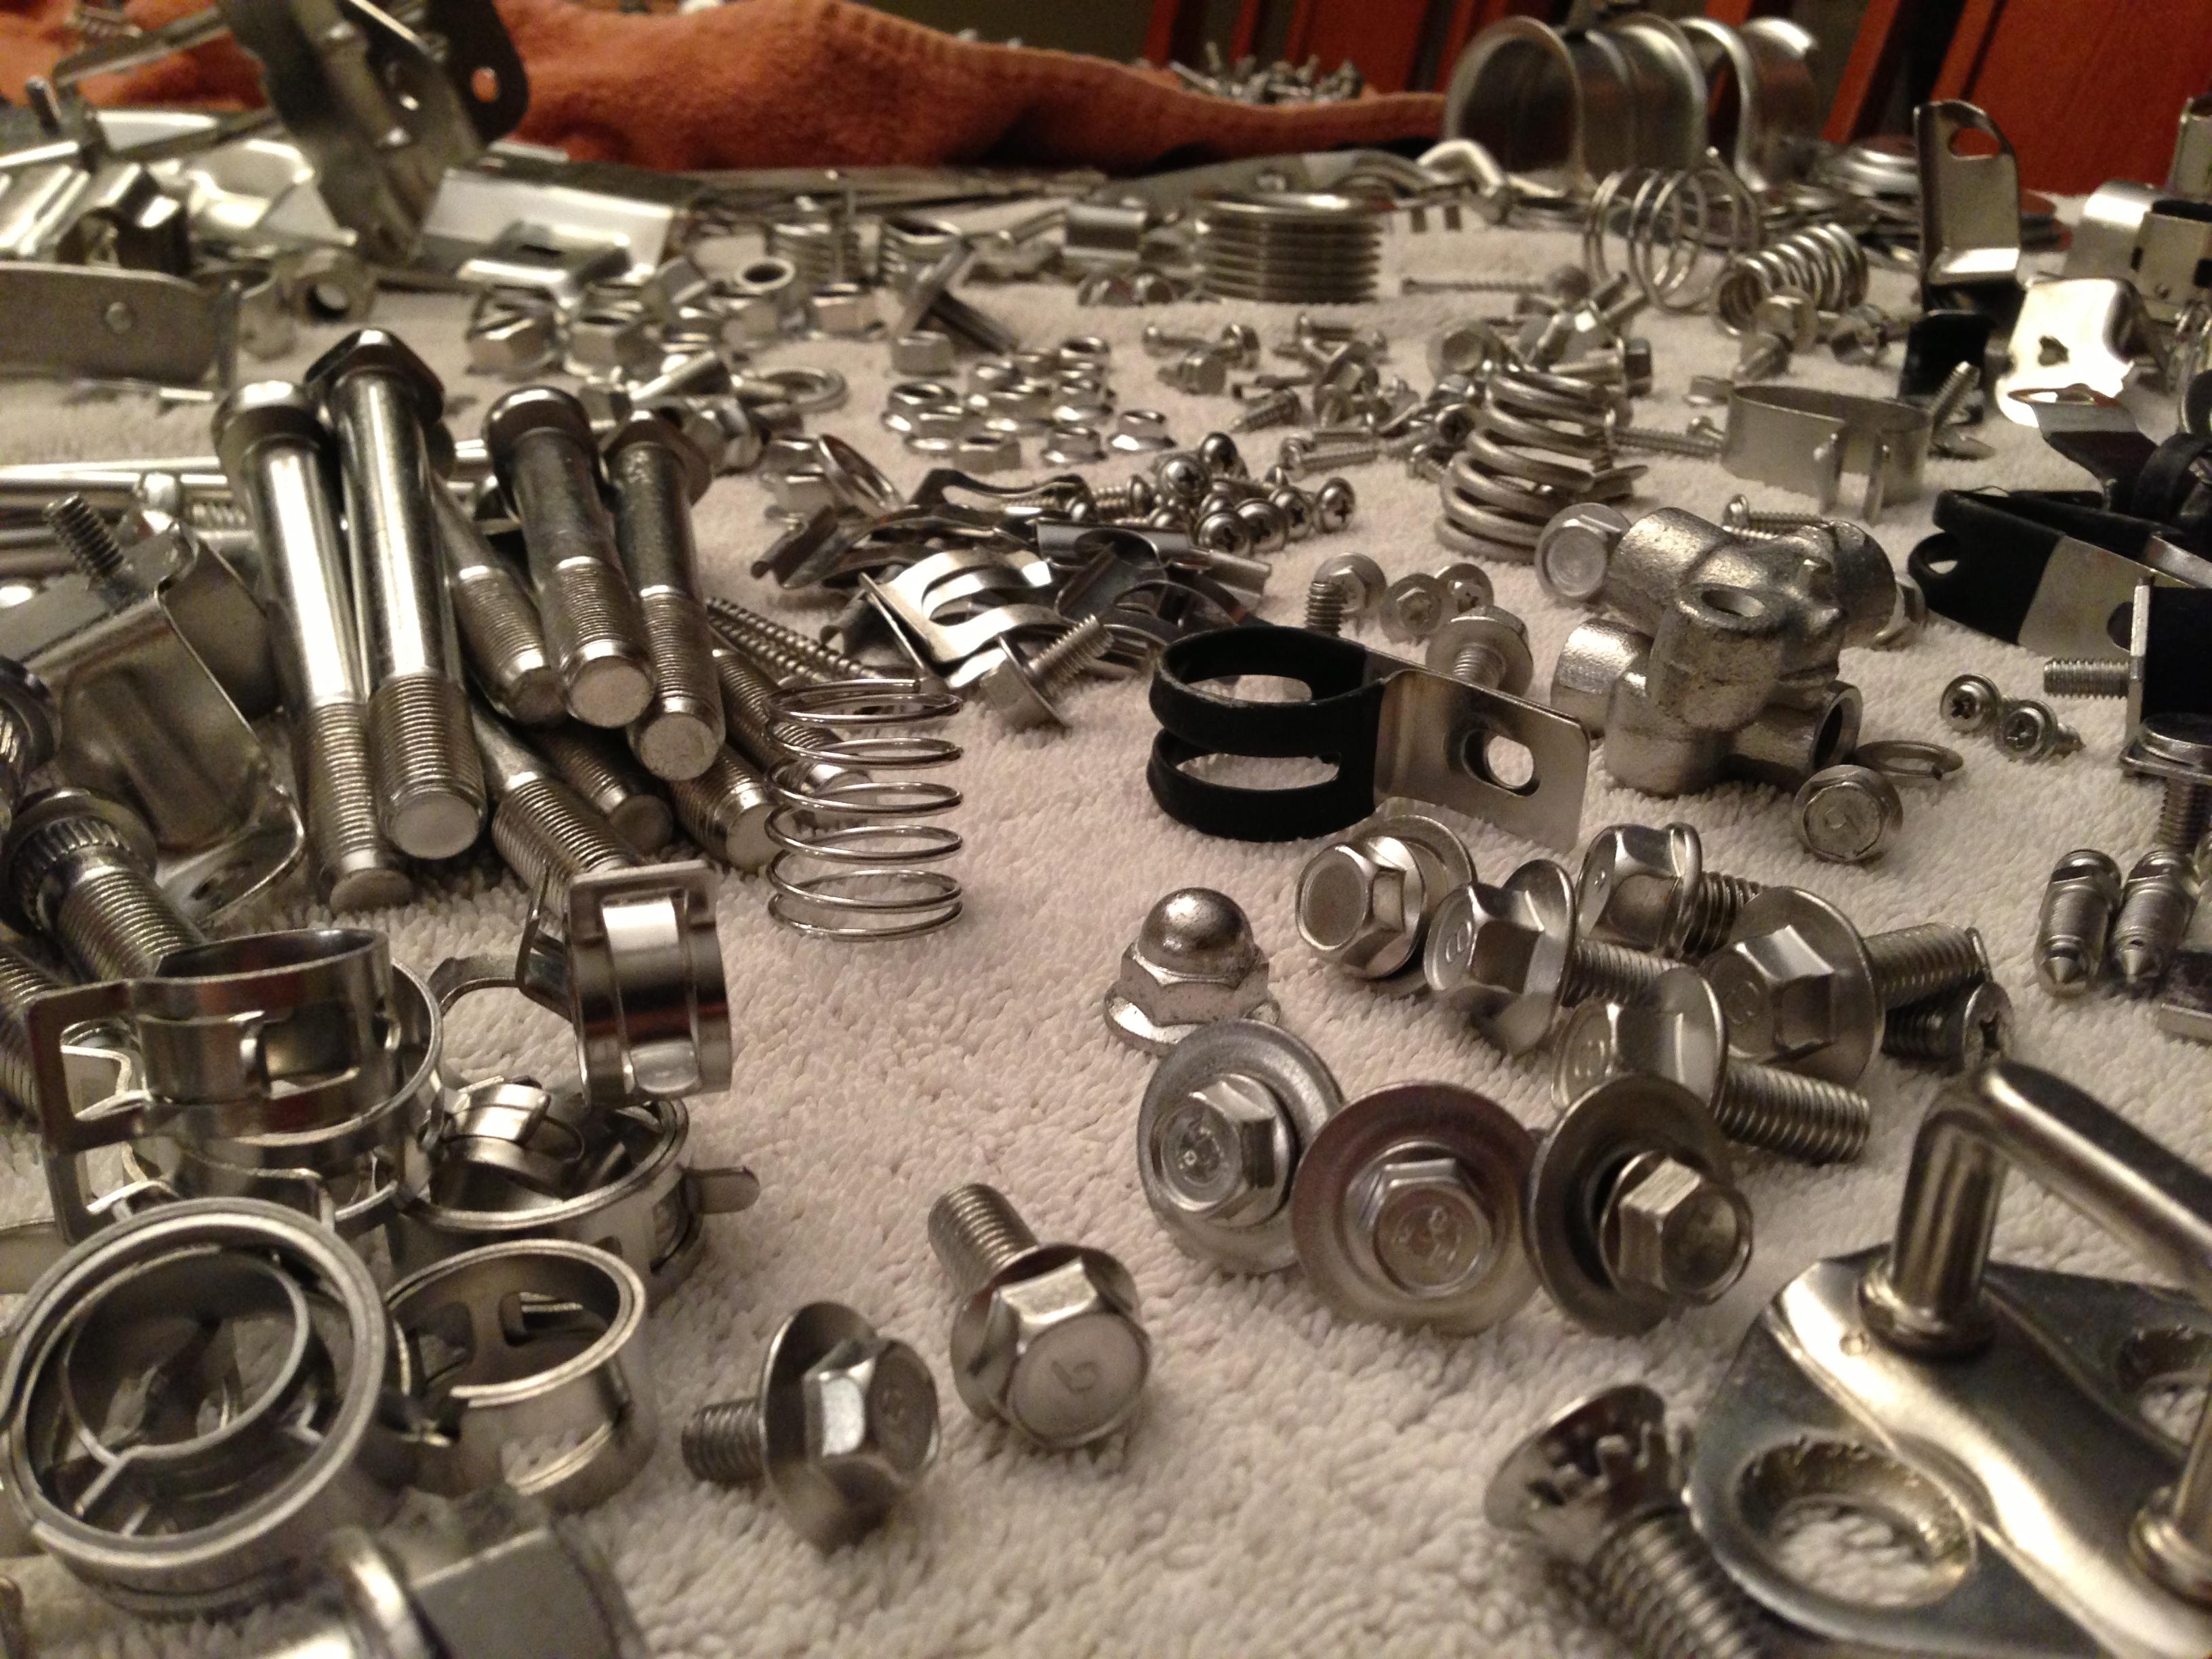 Zinc-Nickel Plated bolts/nuts/screws